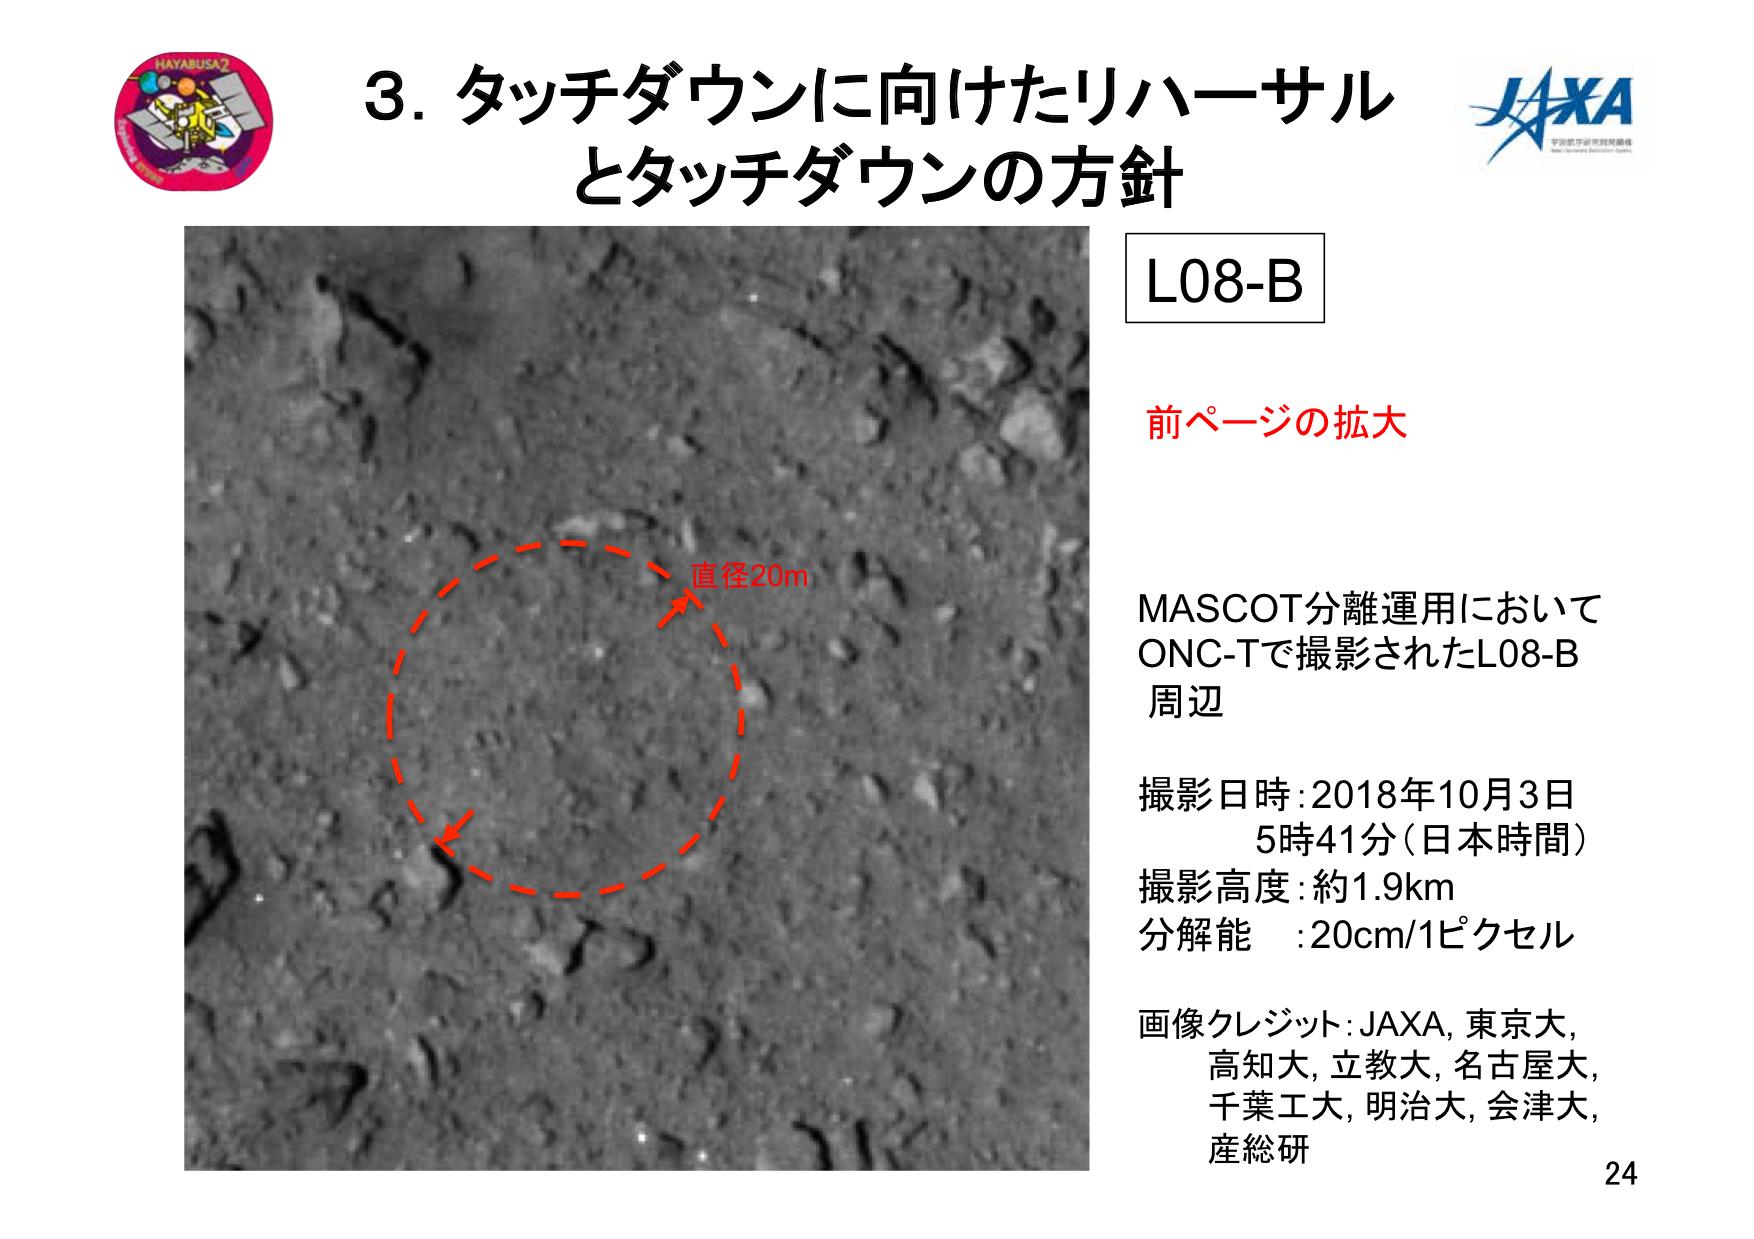 f:id:Imamura:20181011154003p:plain